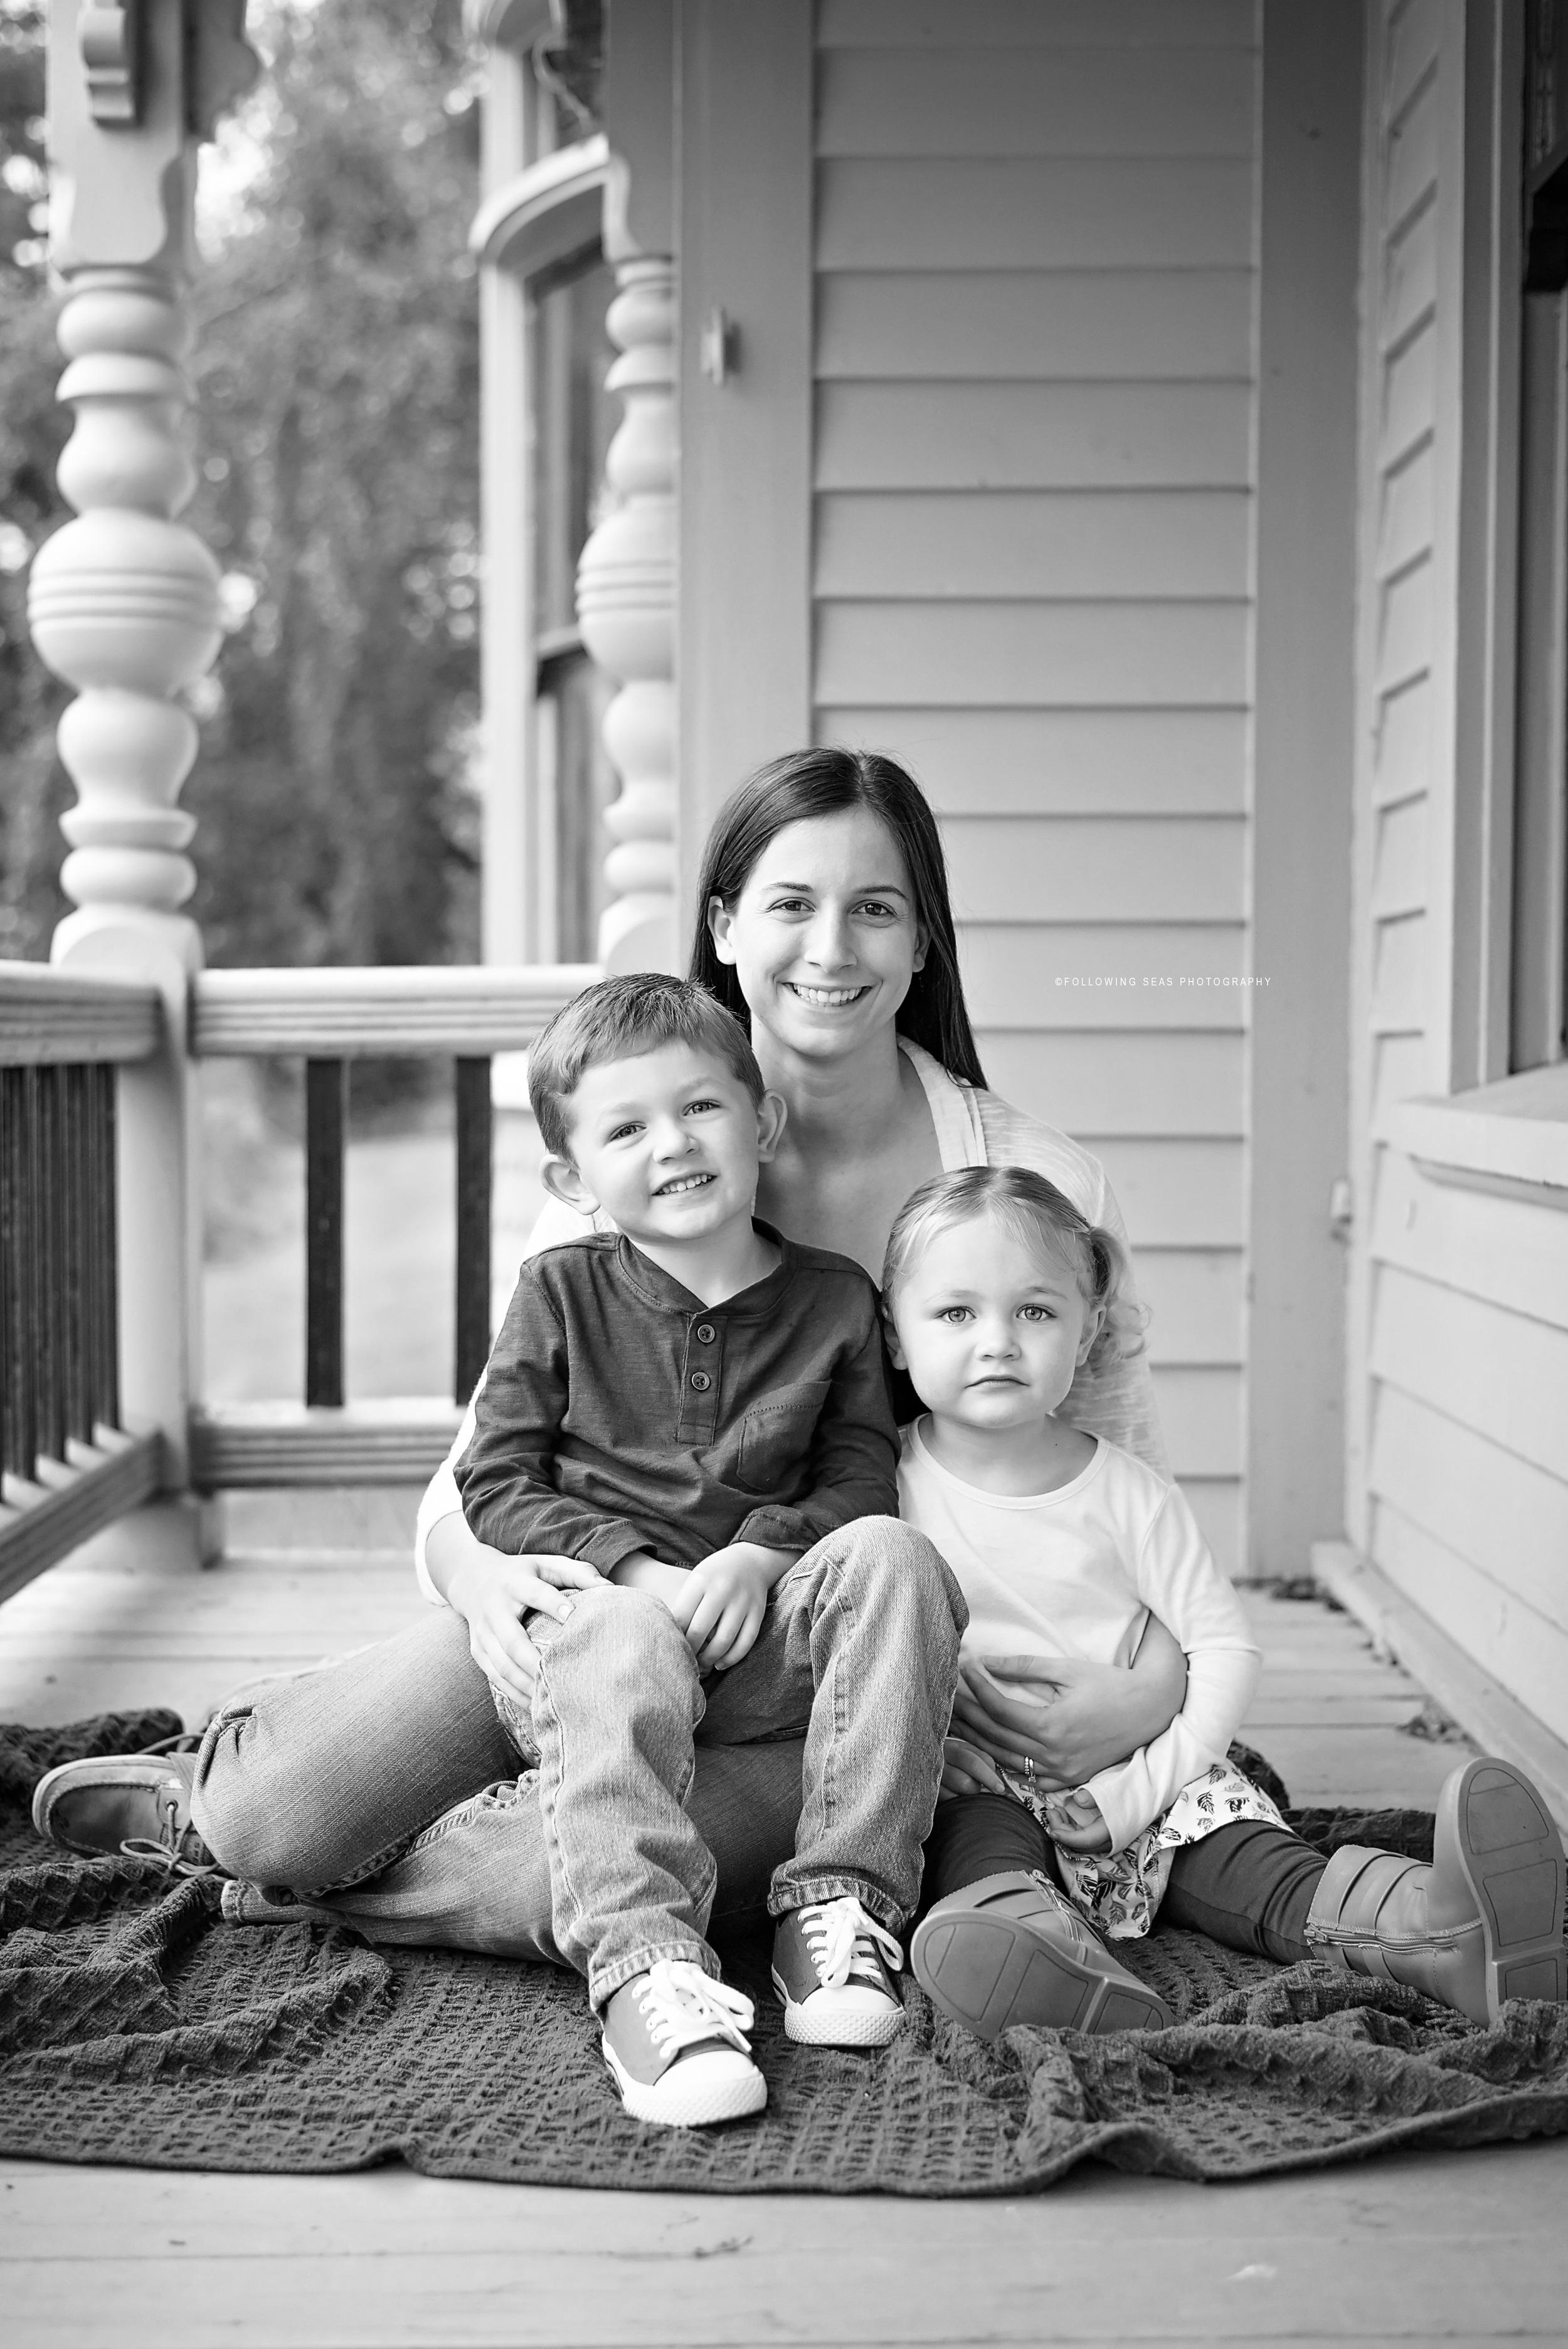 Bremerton-Family-Photographer-Following-Seas-Photography-0176 copyBW copy.jpg